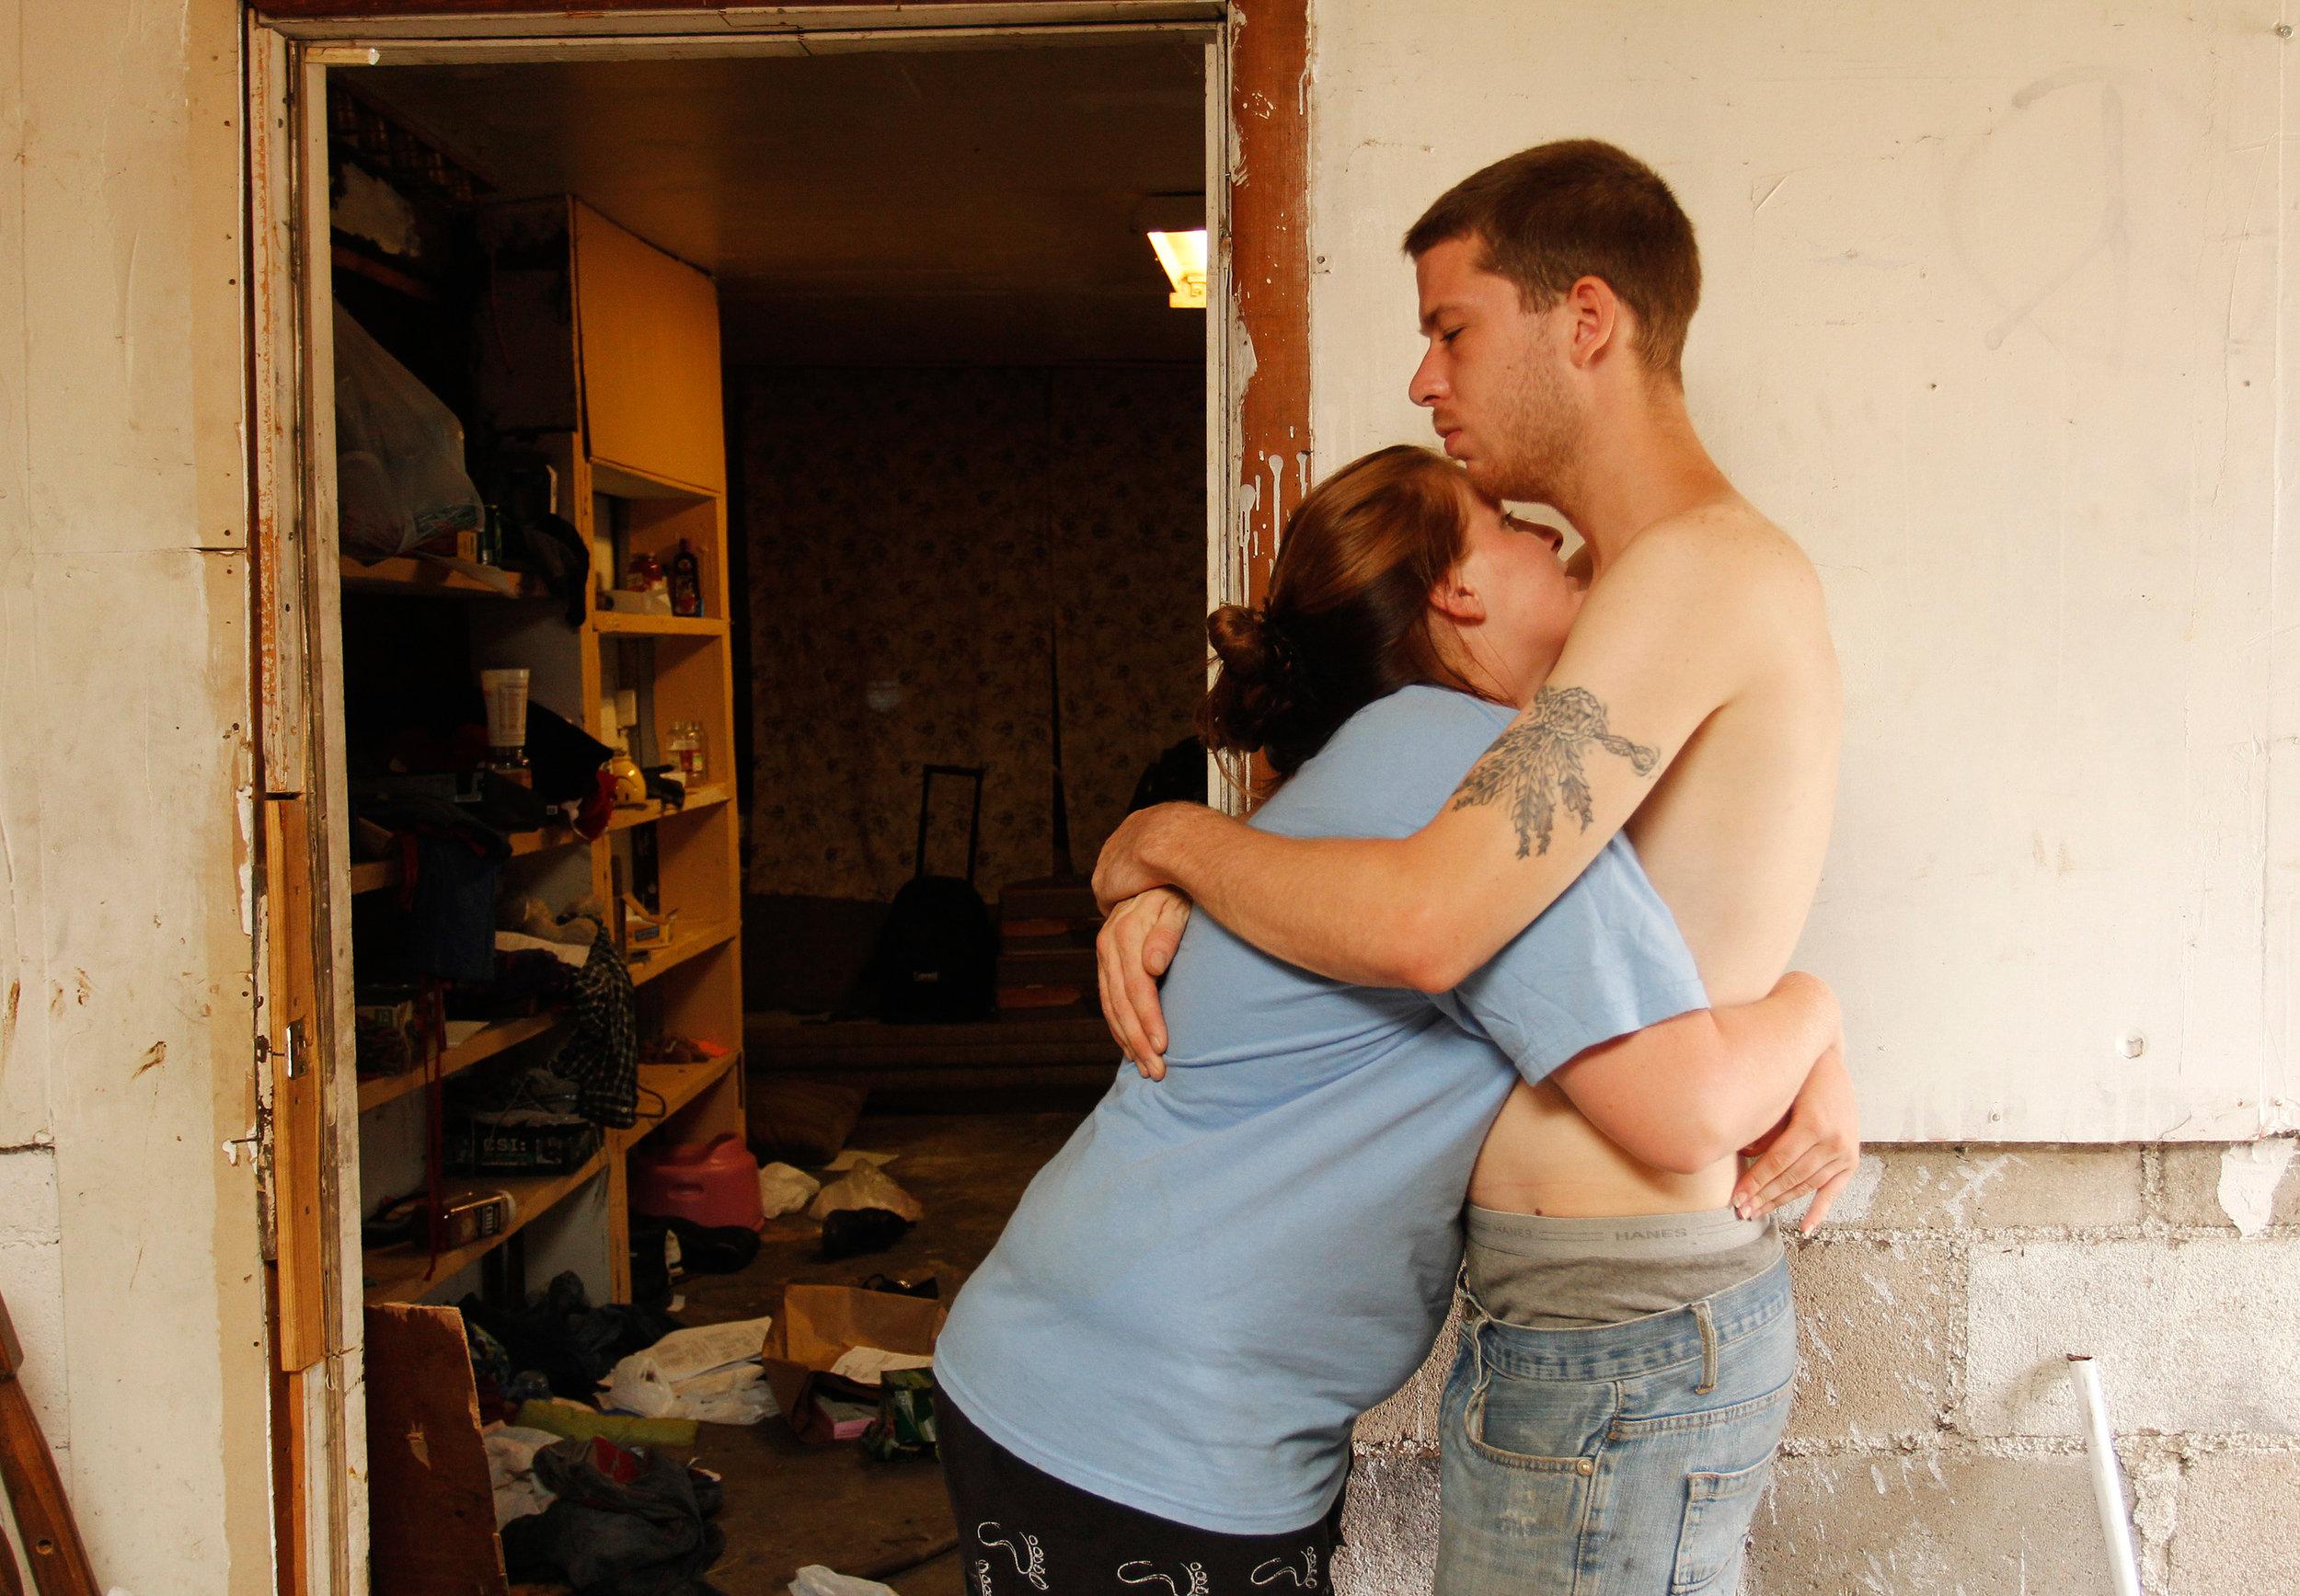 017_20120803_child_poverty.jpg